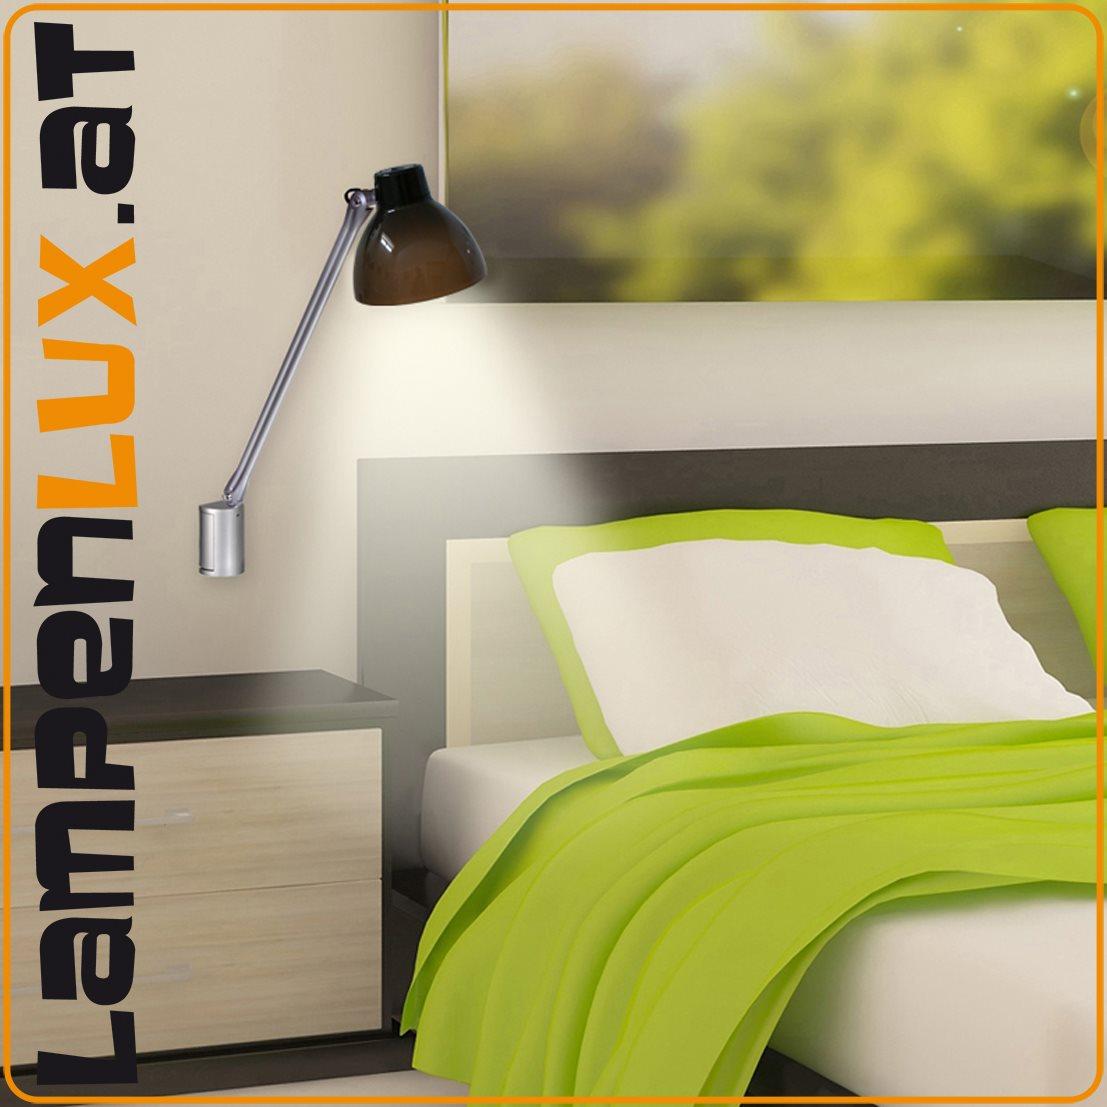 lampenlux led bettlampe pluto bettleuchte wandlampe. Black Bedroom Furniture Sets. Home Design Ideas